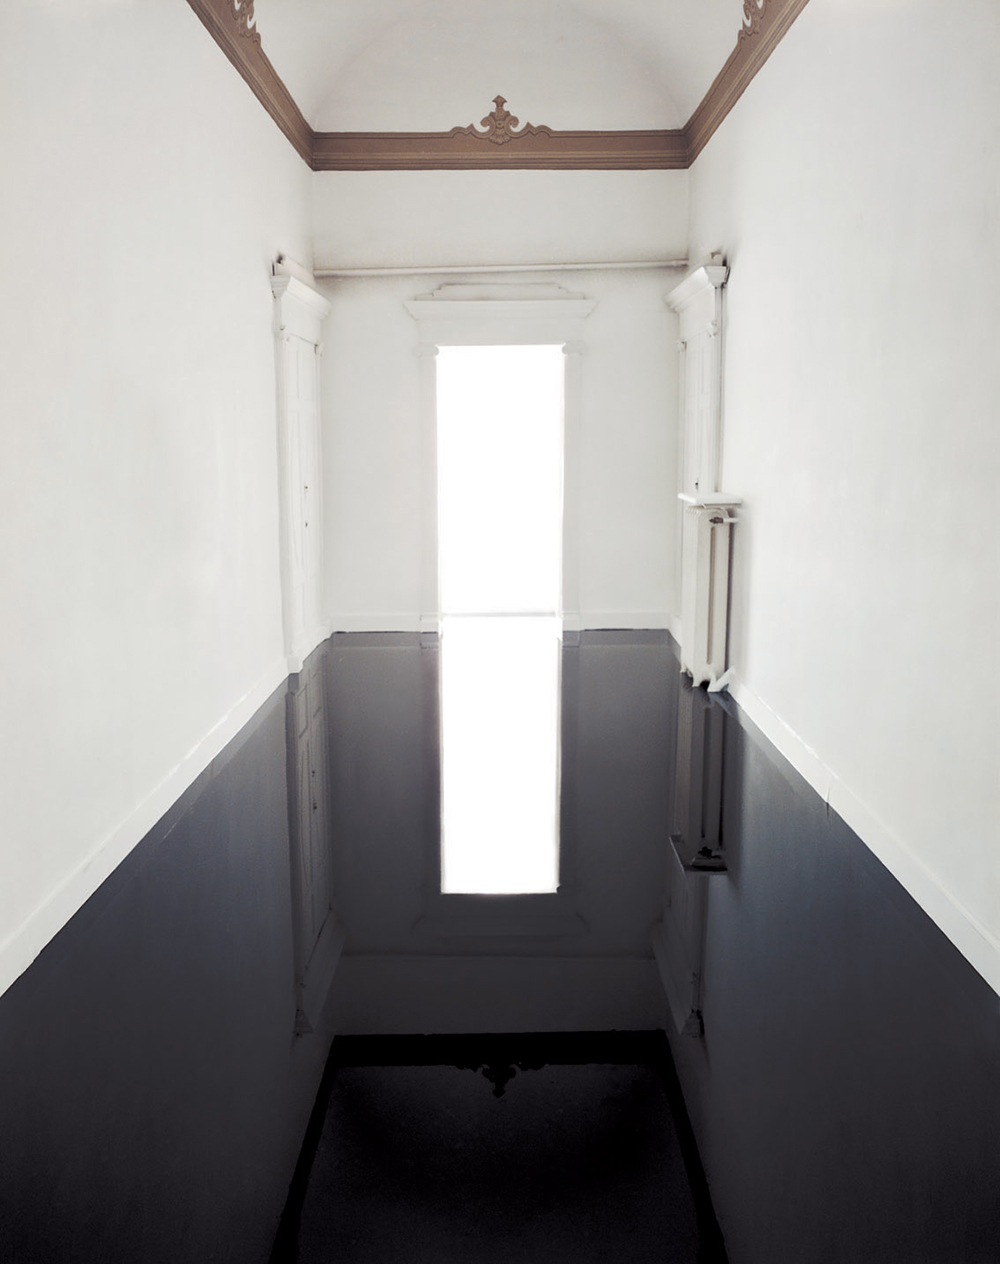 Galleria Persano (oil room), 1997, stampa lambda, cm 151x119